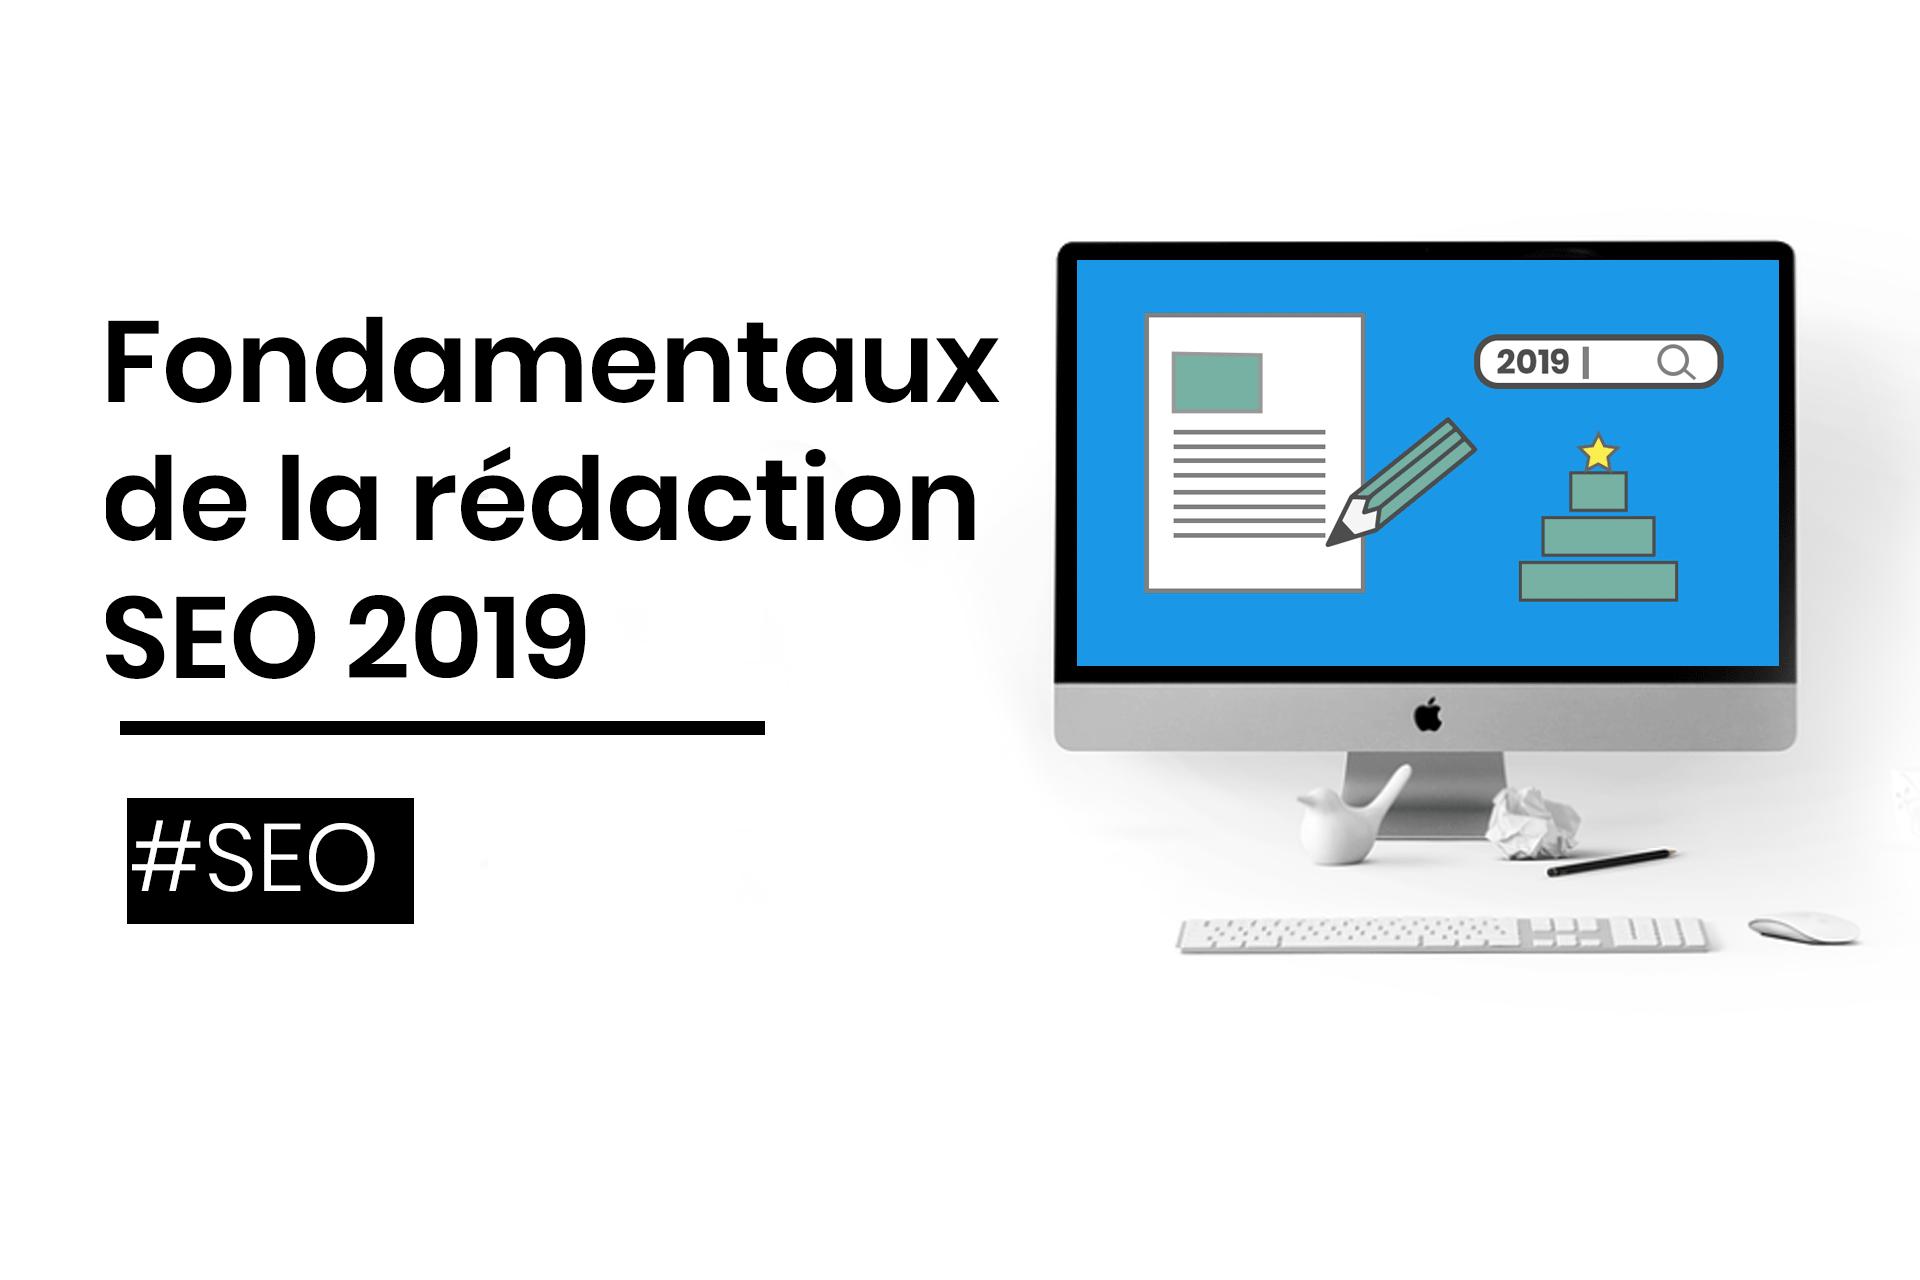 redaction seo fondamentaux 2019